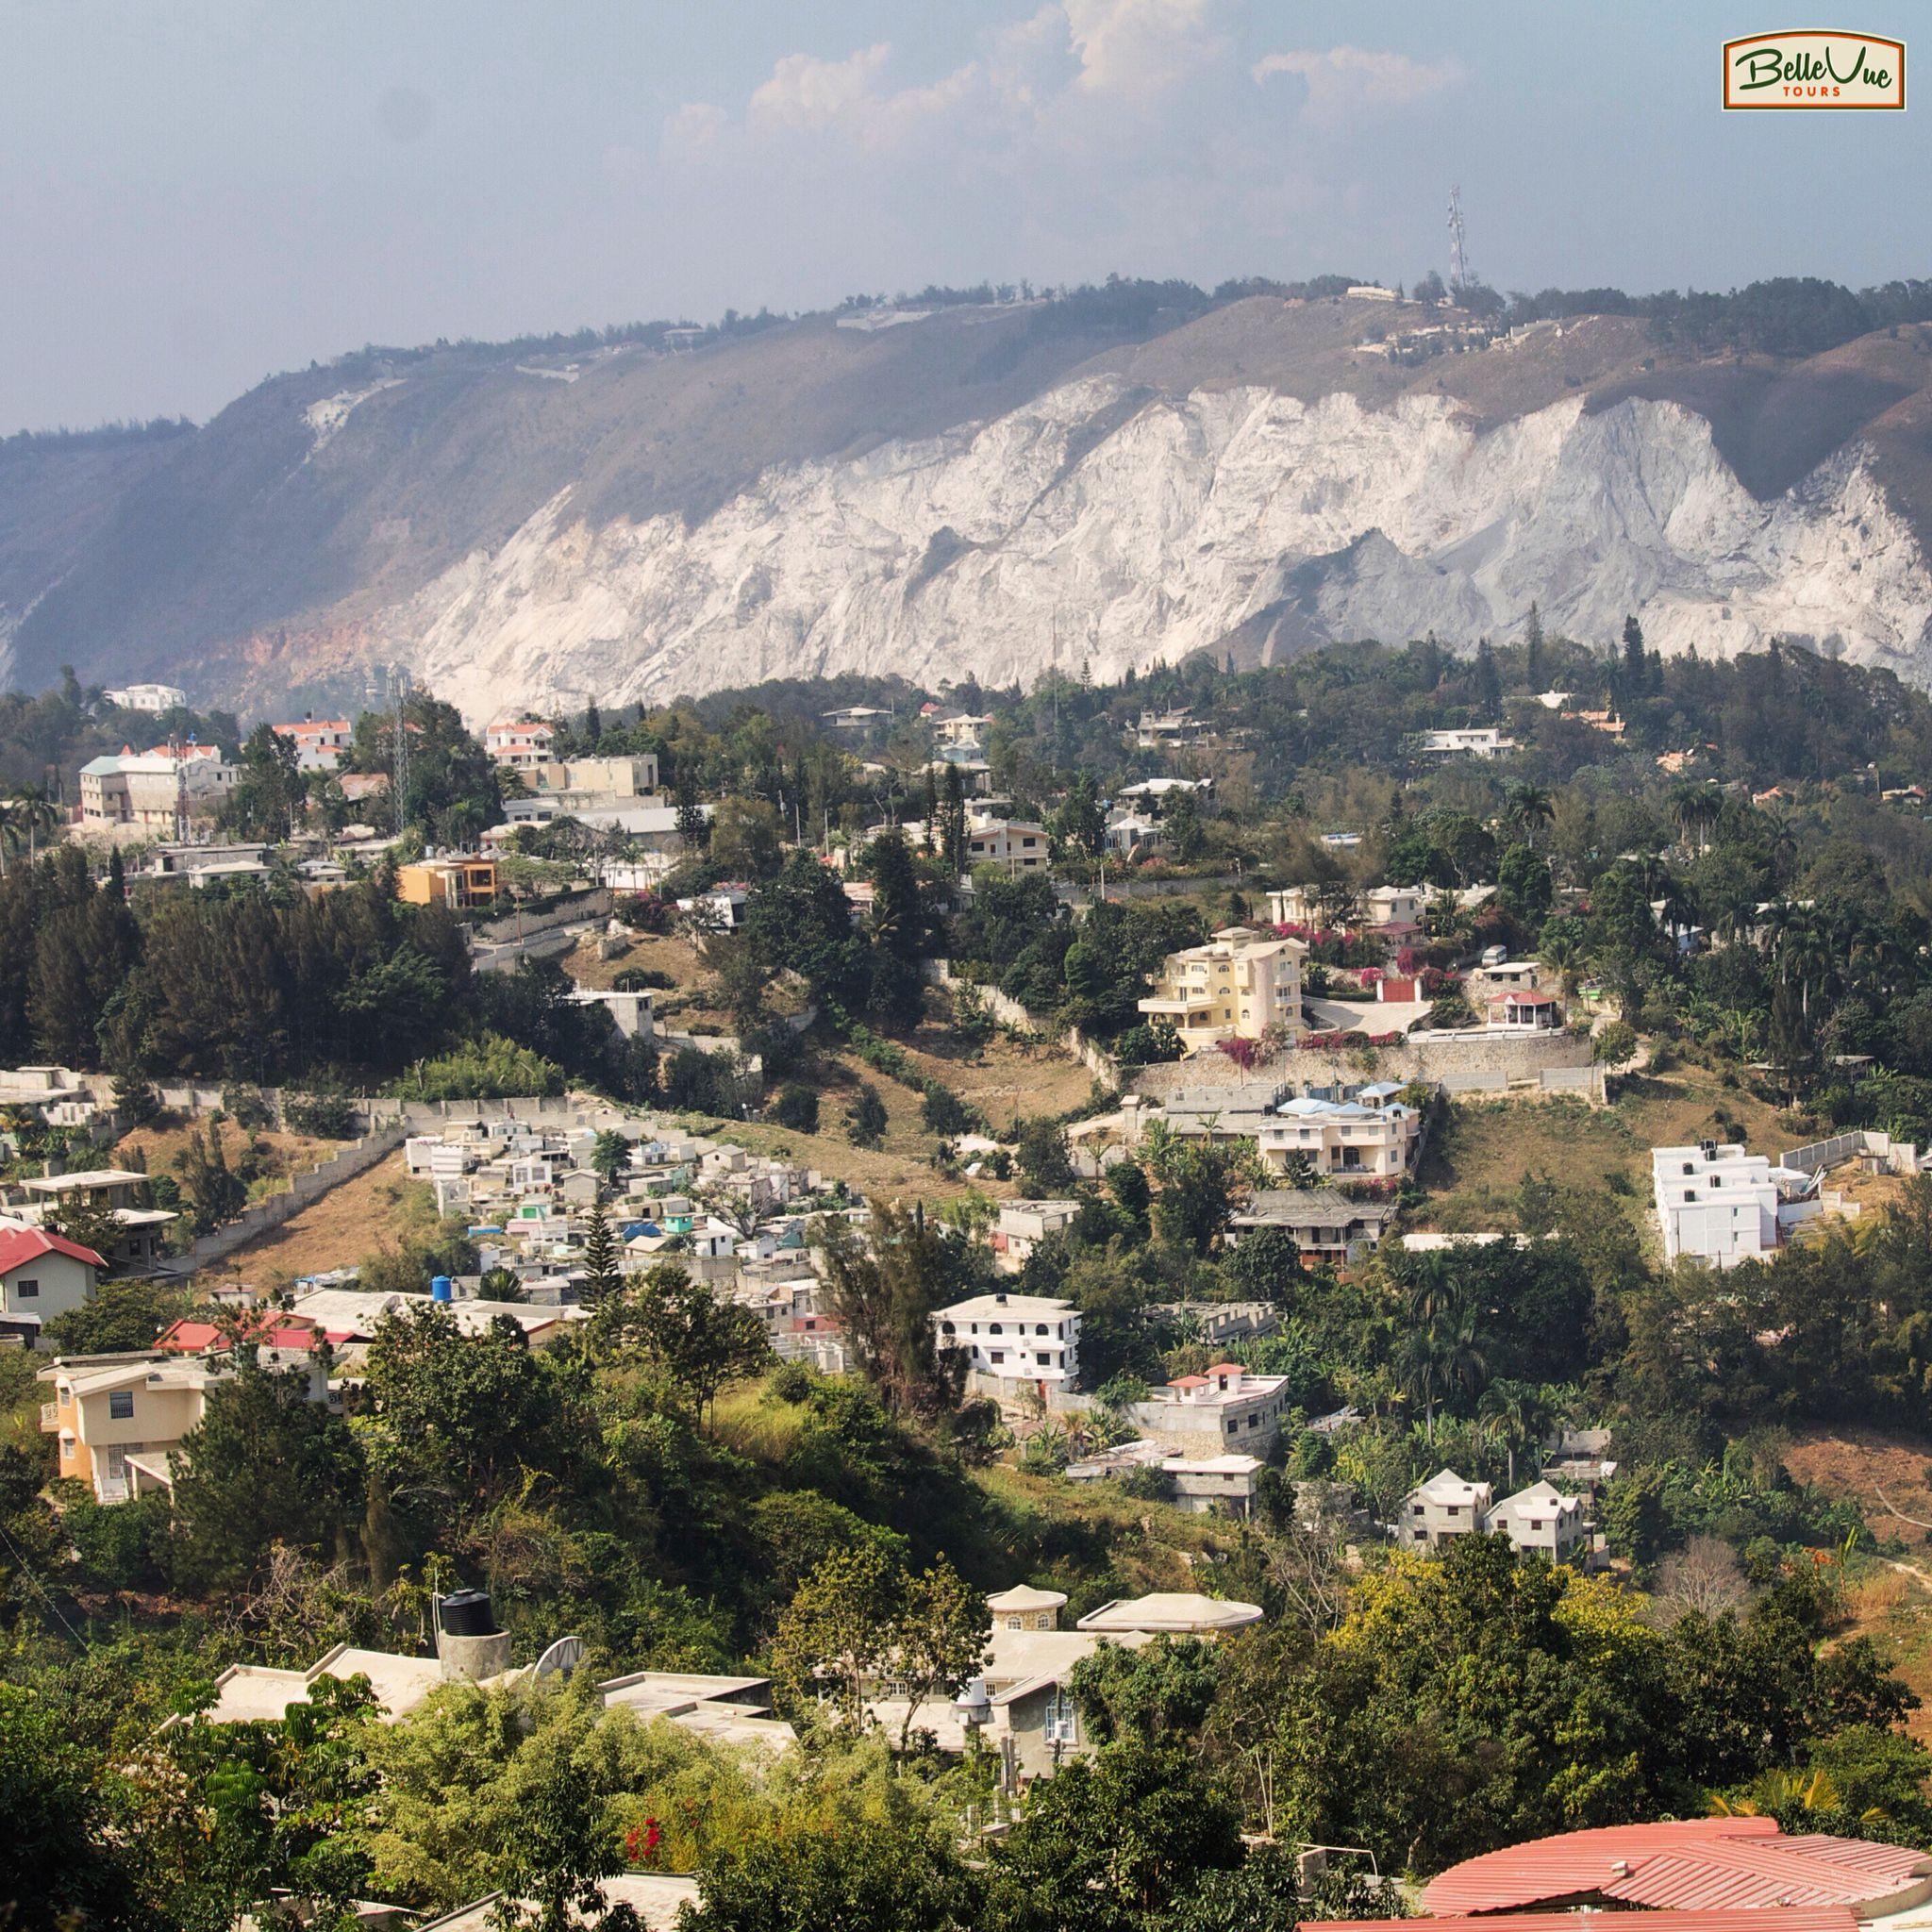 Panaromic View In Fermathe Haiti Beaches Travel Photography Port Au Prince